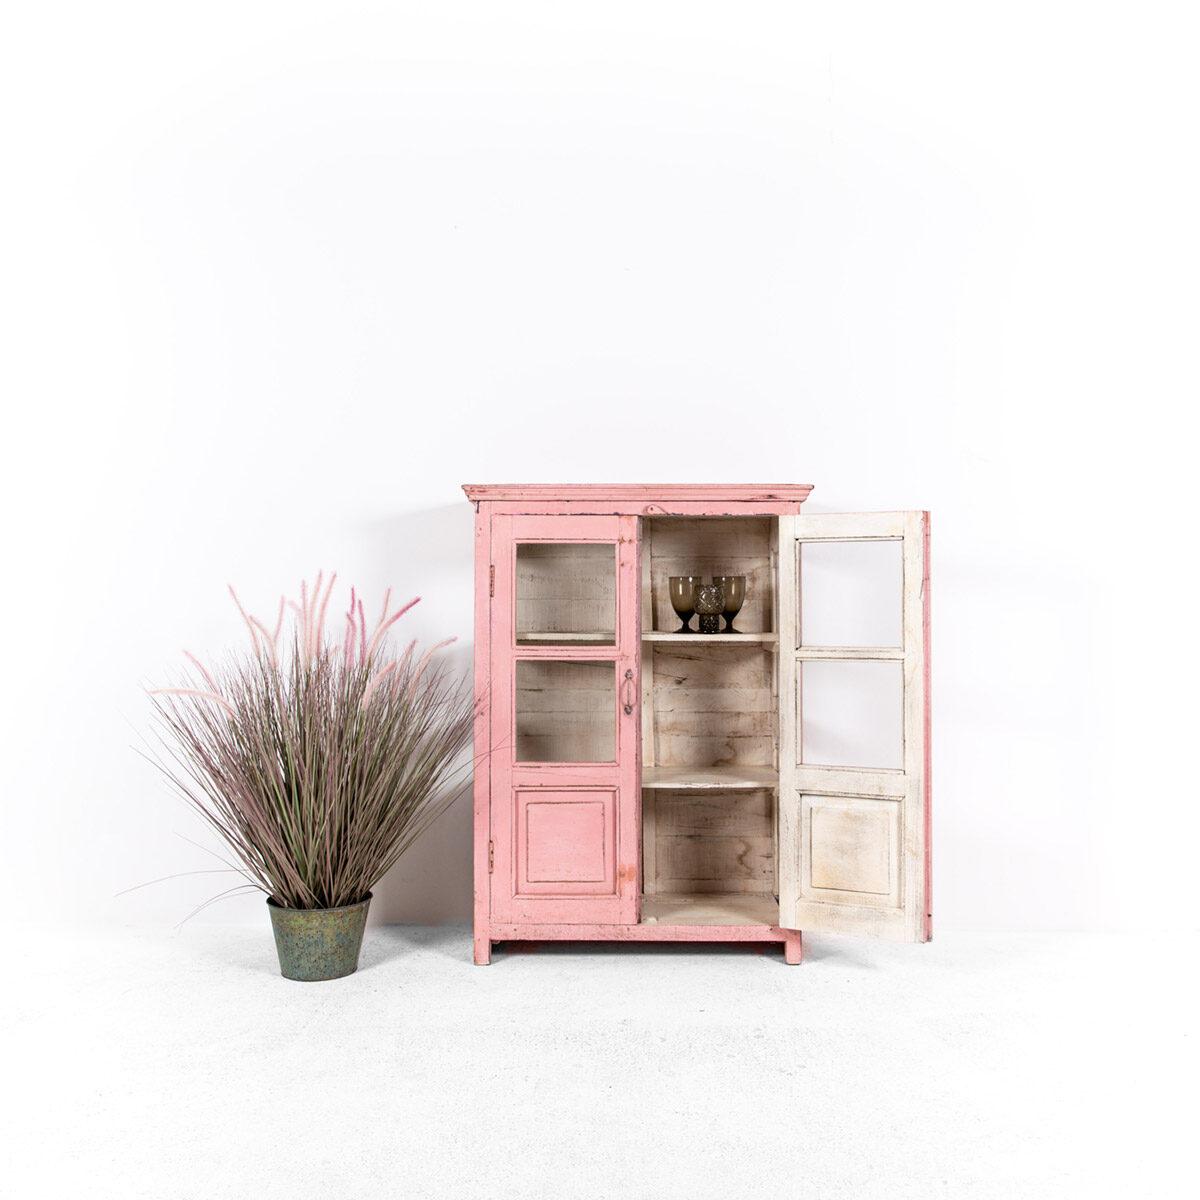 Roze-vitrinekast-2-glazen-deuren-2